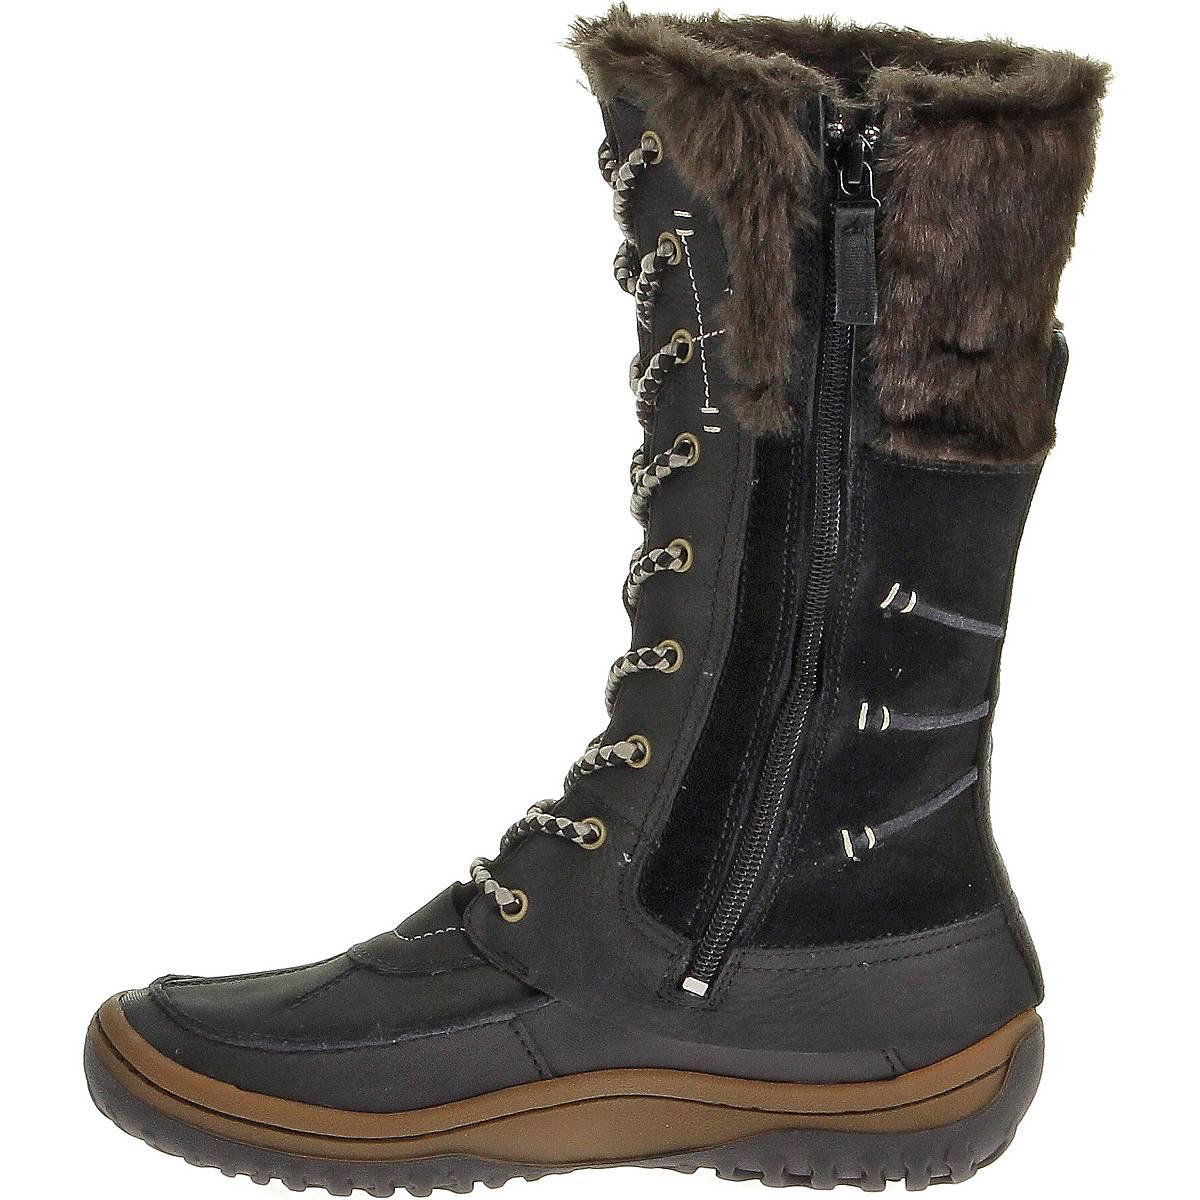 Merrell Decora Prelude Waterproof Boots Womens